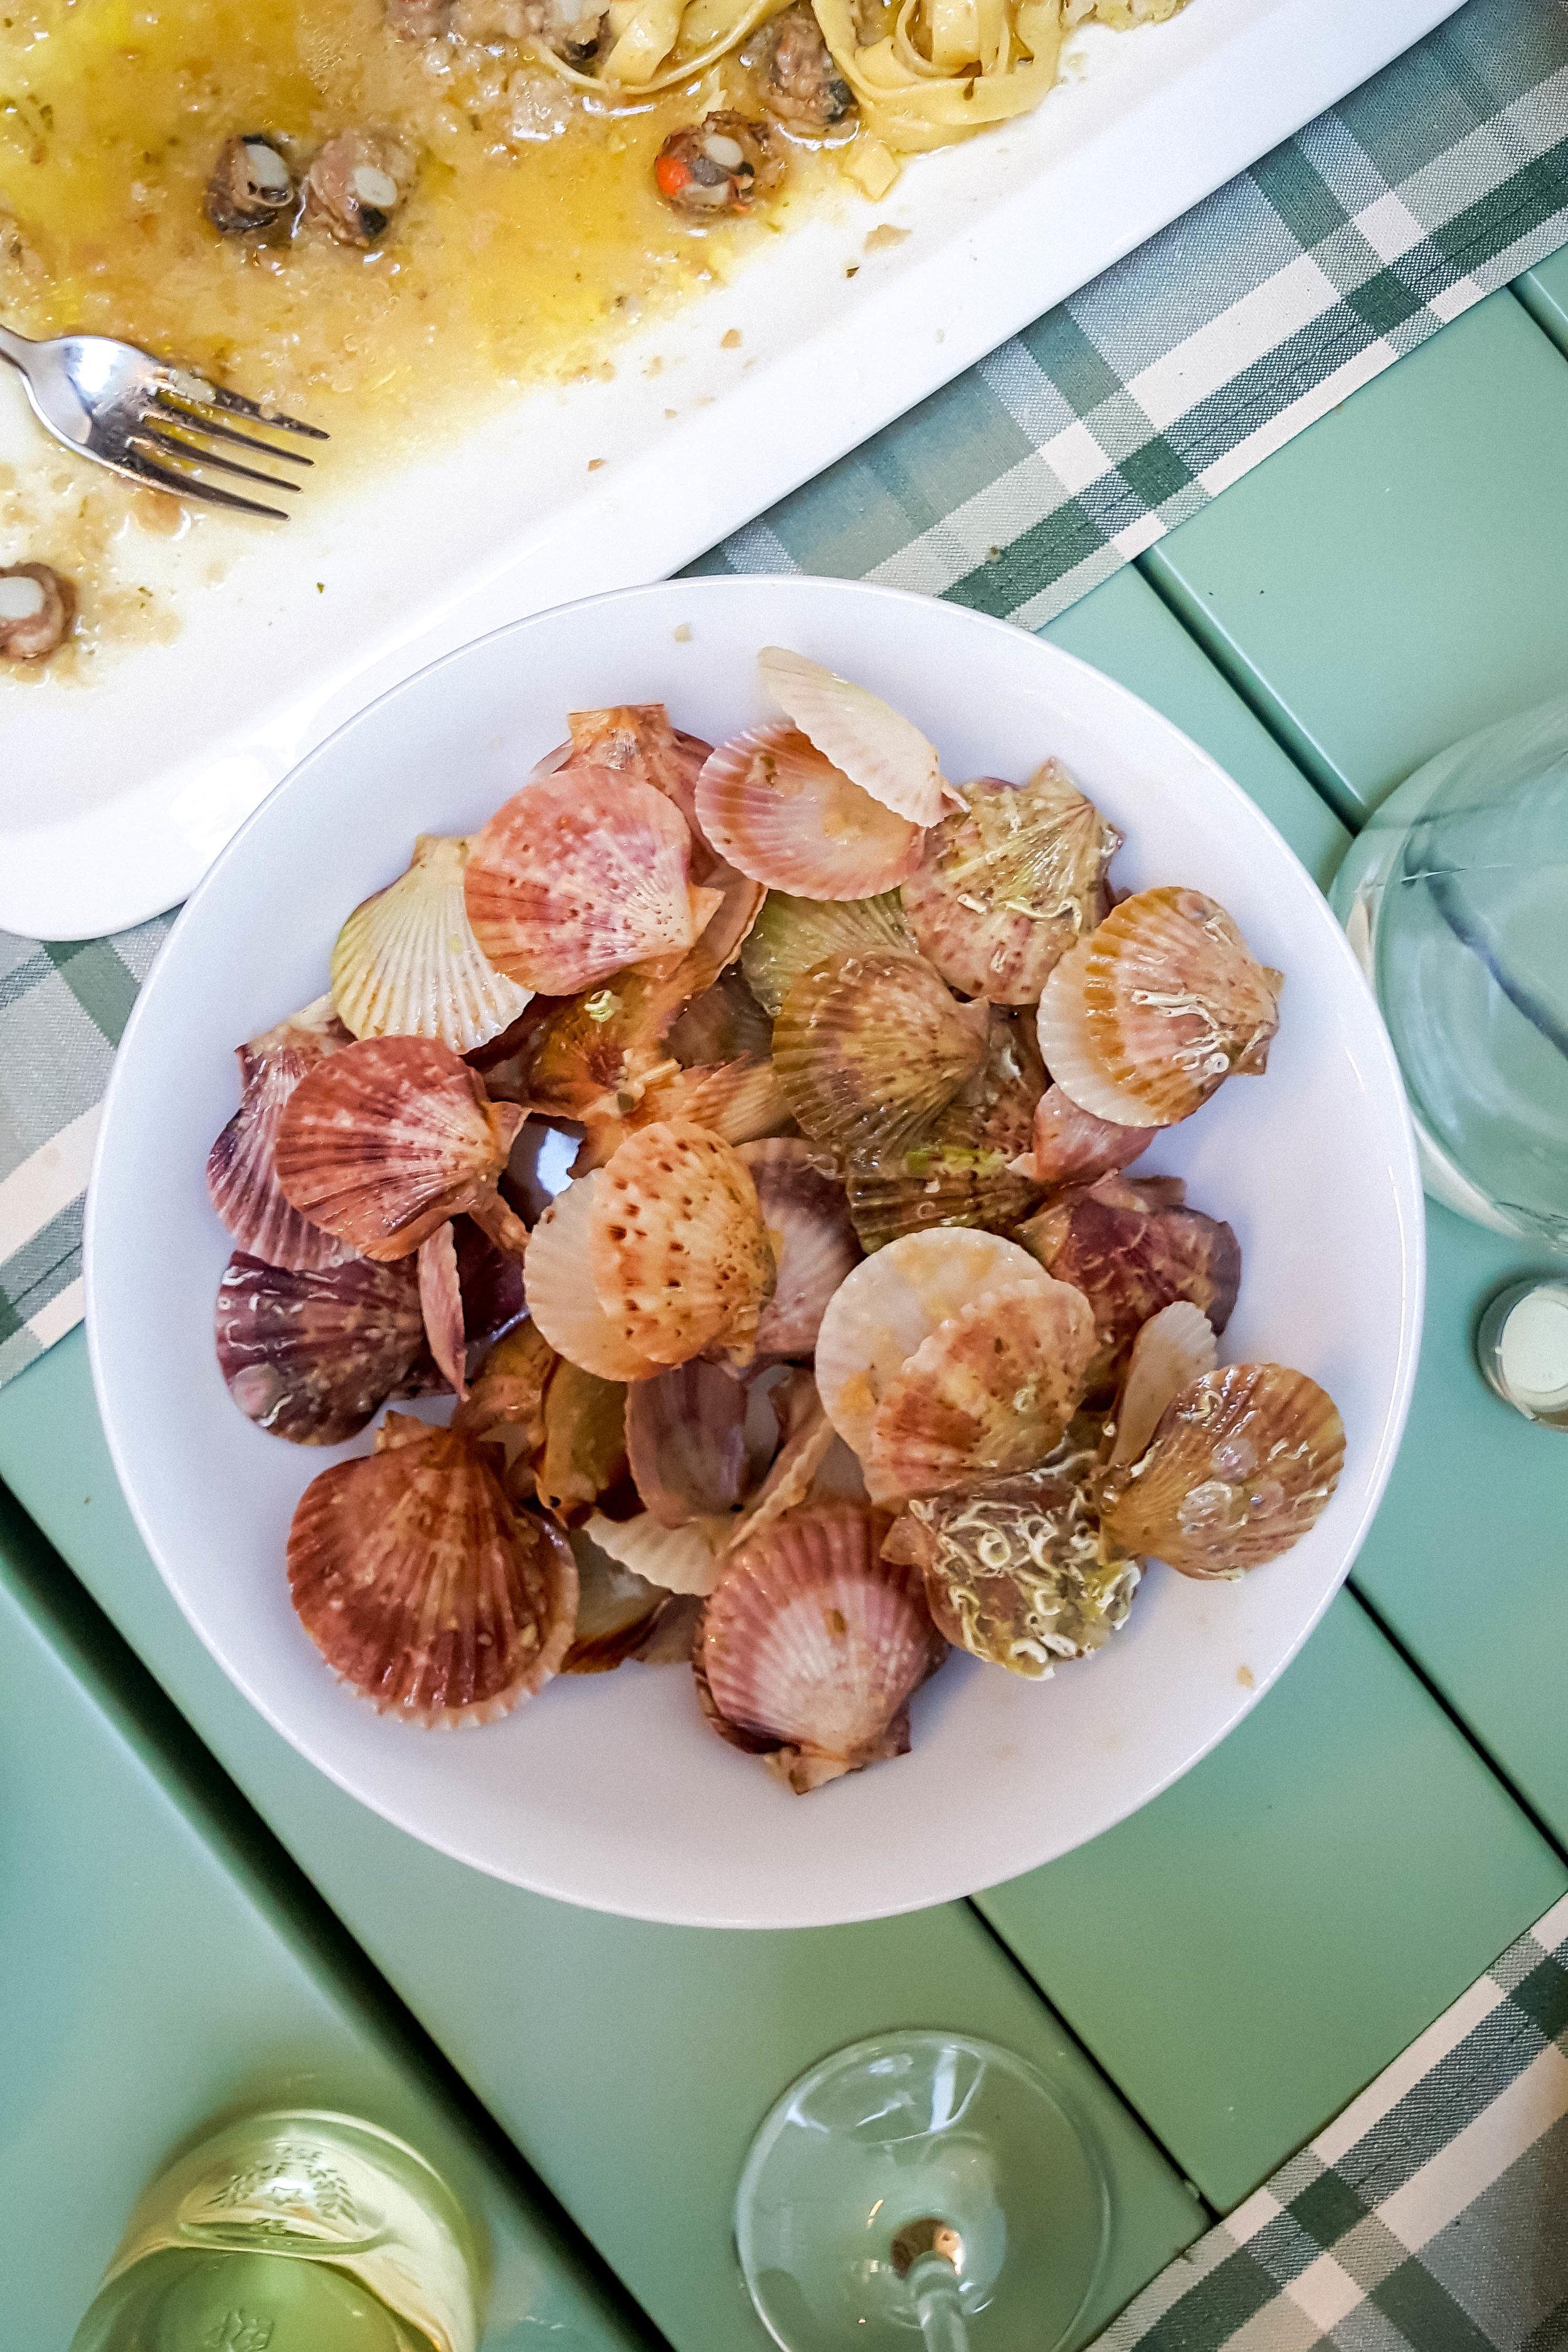 Mussels tagliatelle in Trattoria Vodnjanka, Istria